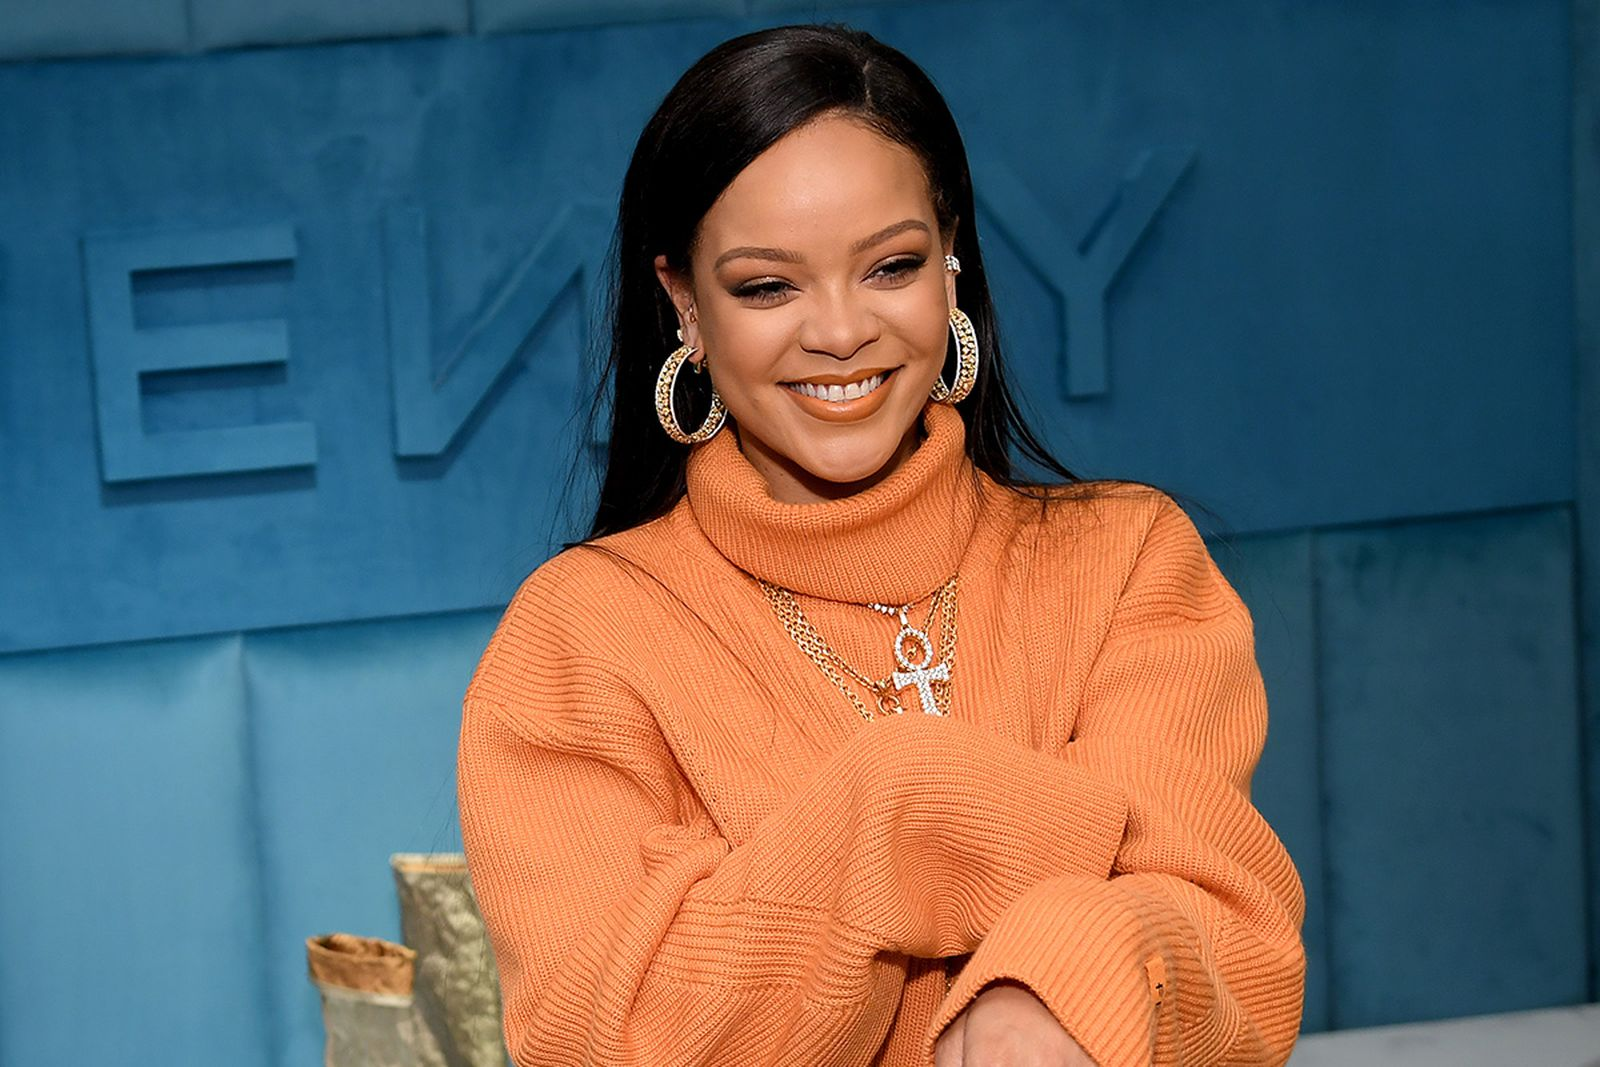 Rihanna celebrates the launch of FENTY at Bergdorf Goodman